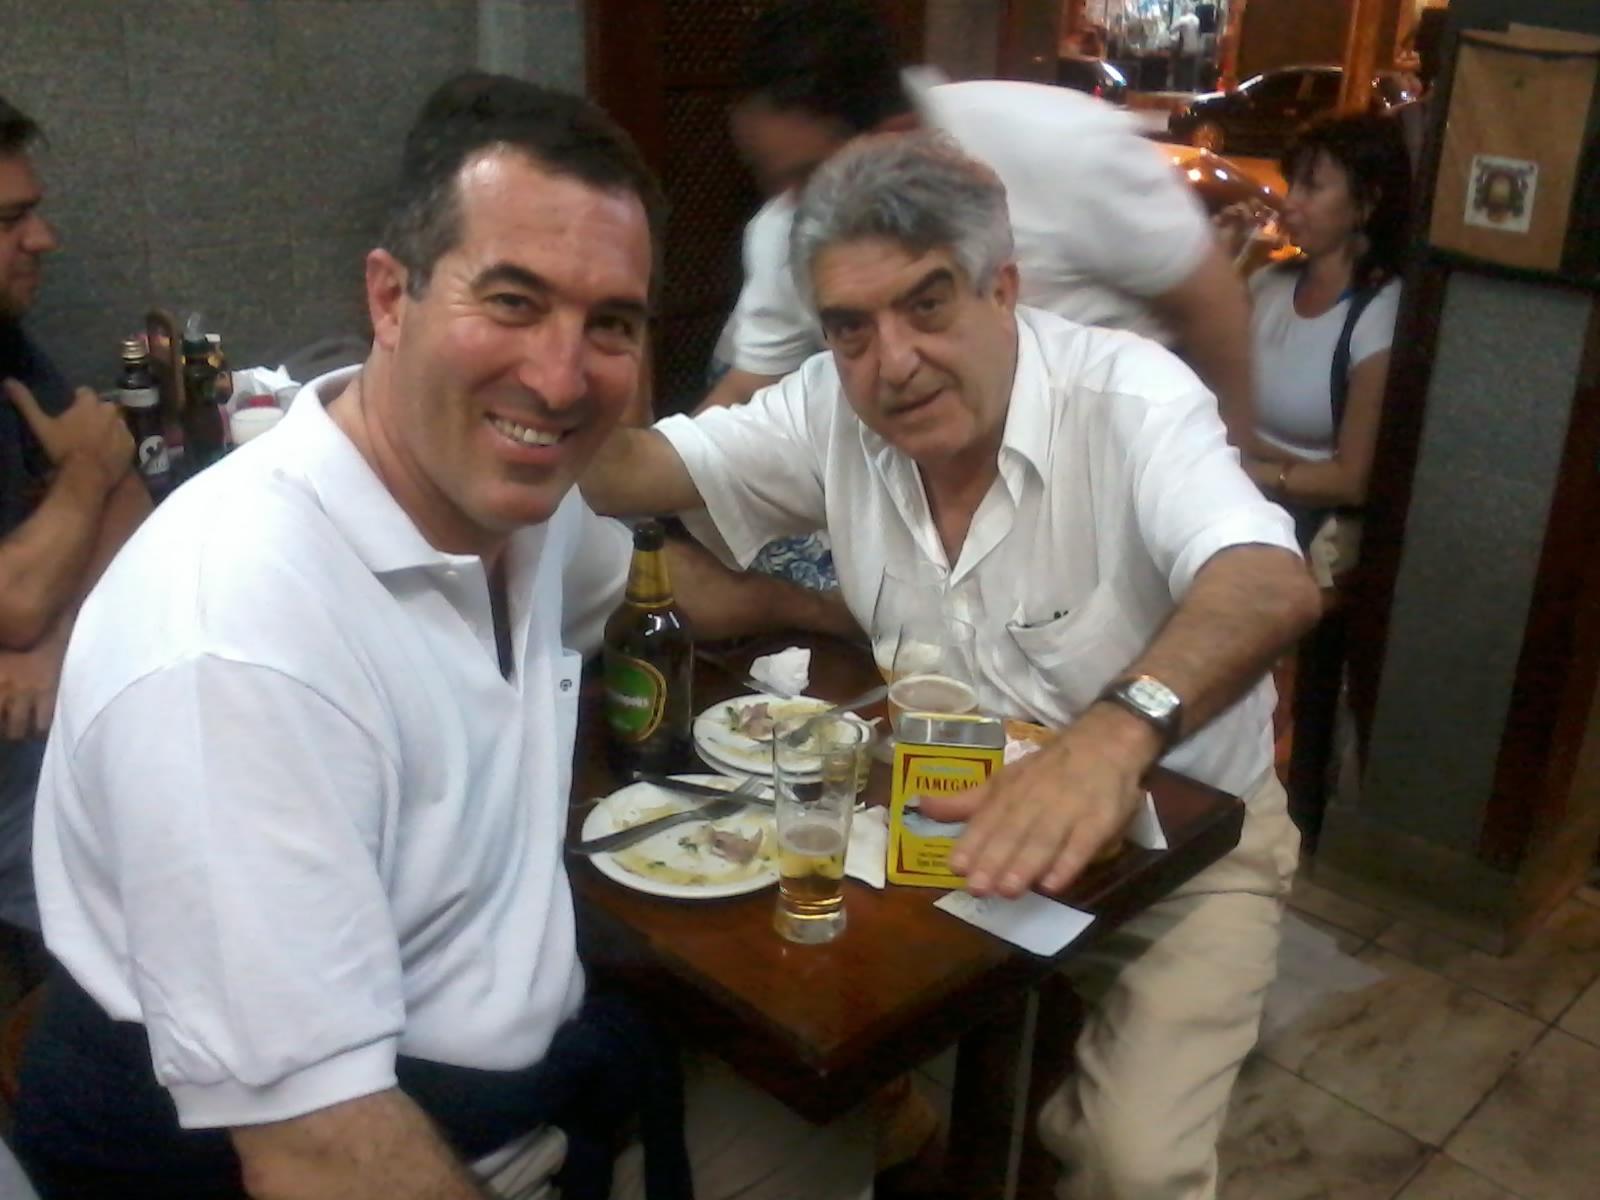 Gilberto Vasconcelos y Marcelo Gullo 2014-10-25 19.32.17